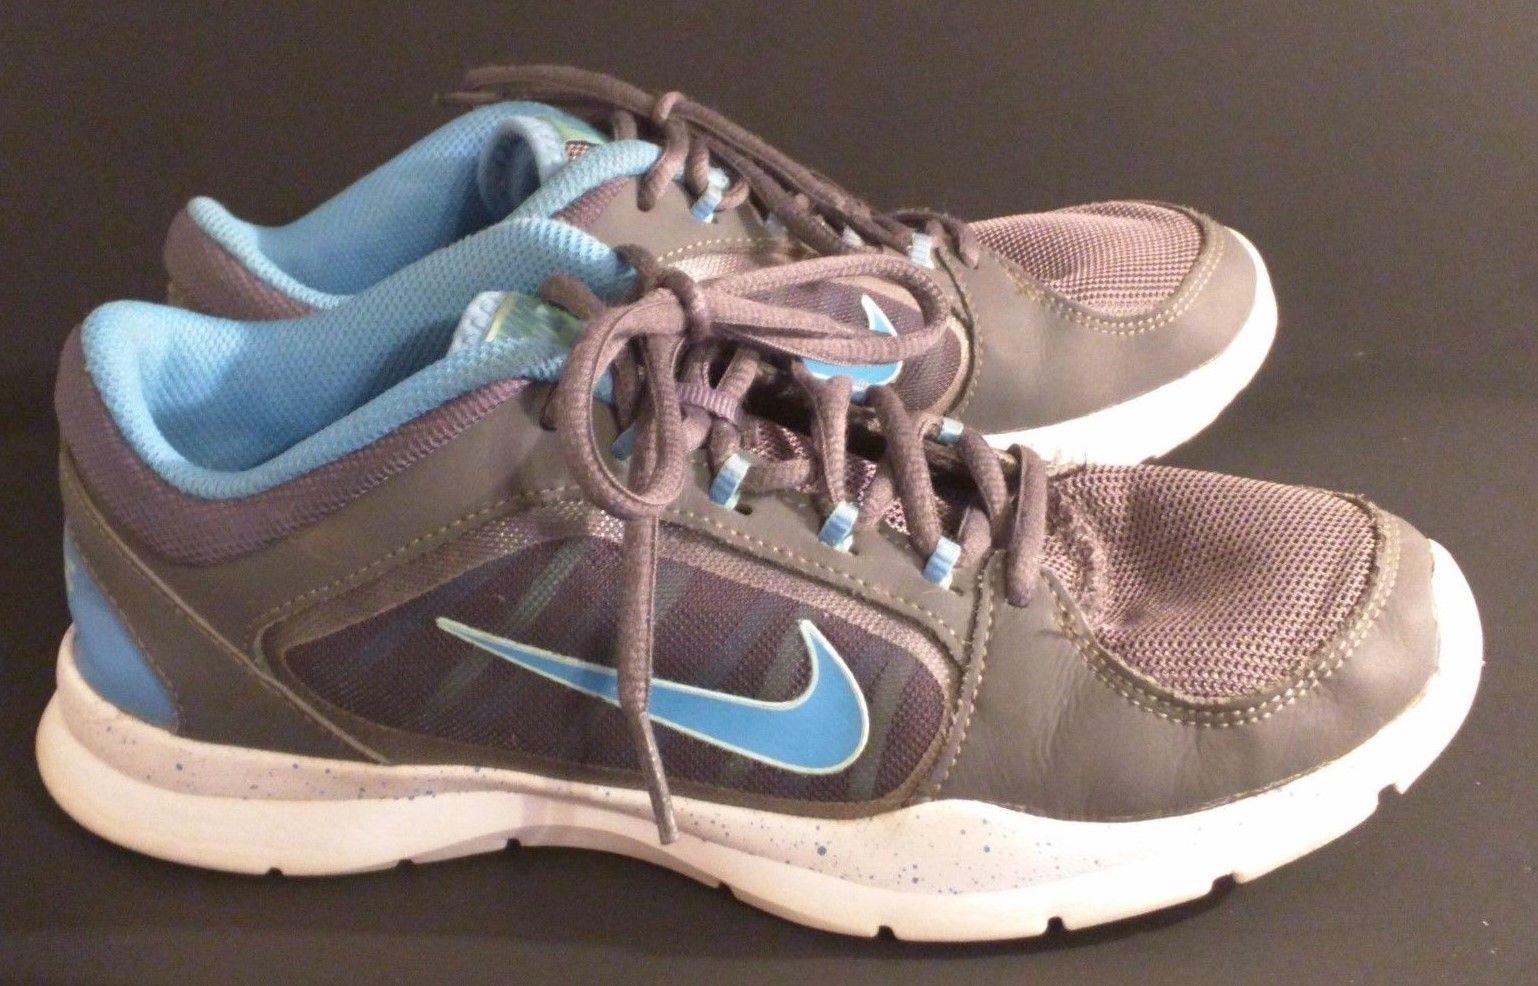 New Balance Athletic Schuhes  2 listings listings listings e87771